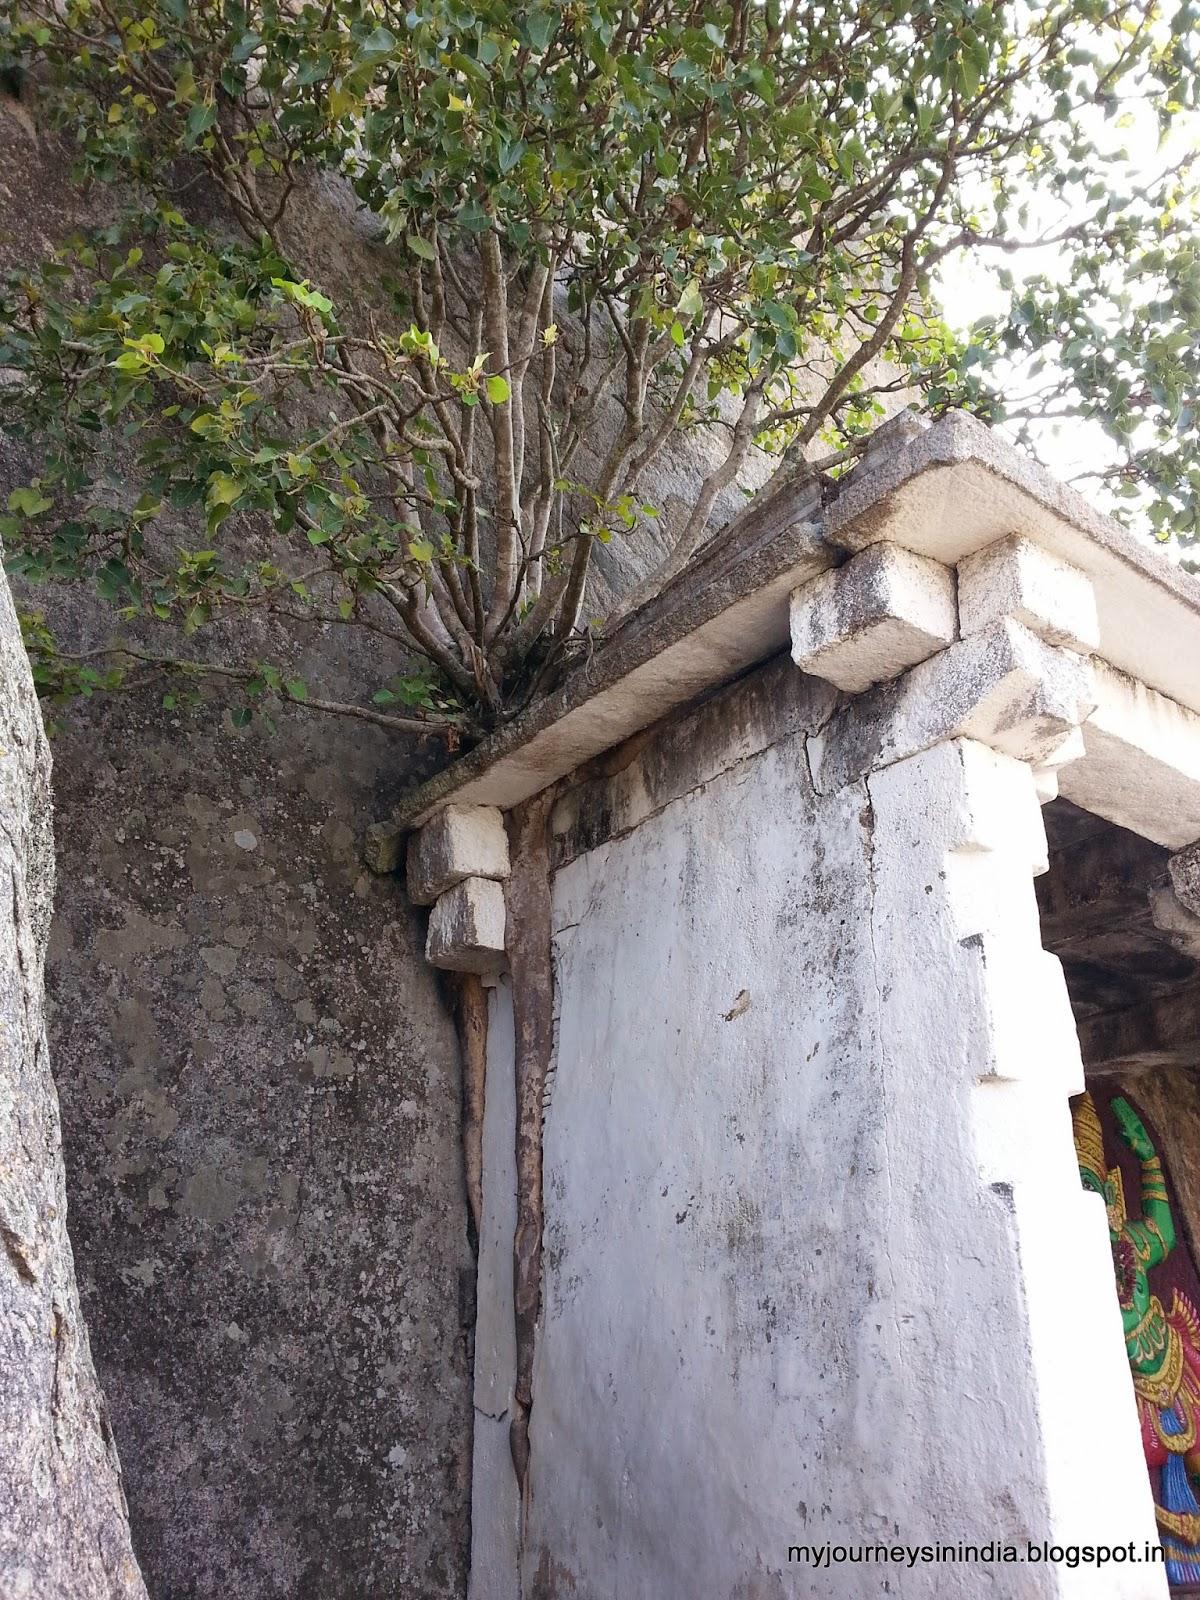 Trees growing on rocks - Devarayanadurga